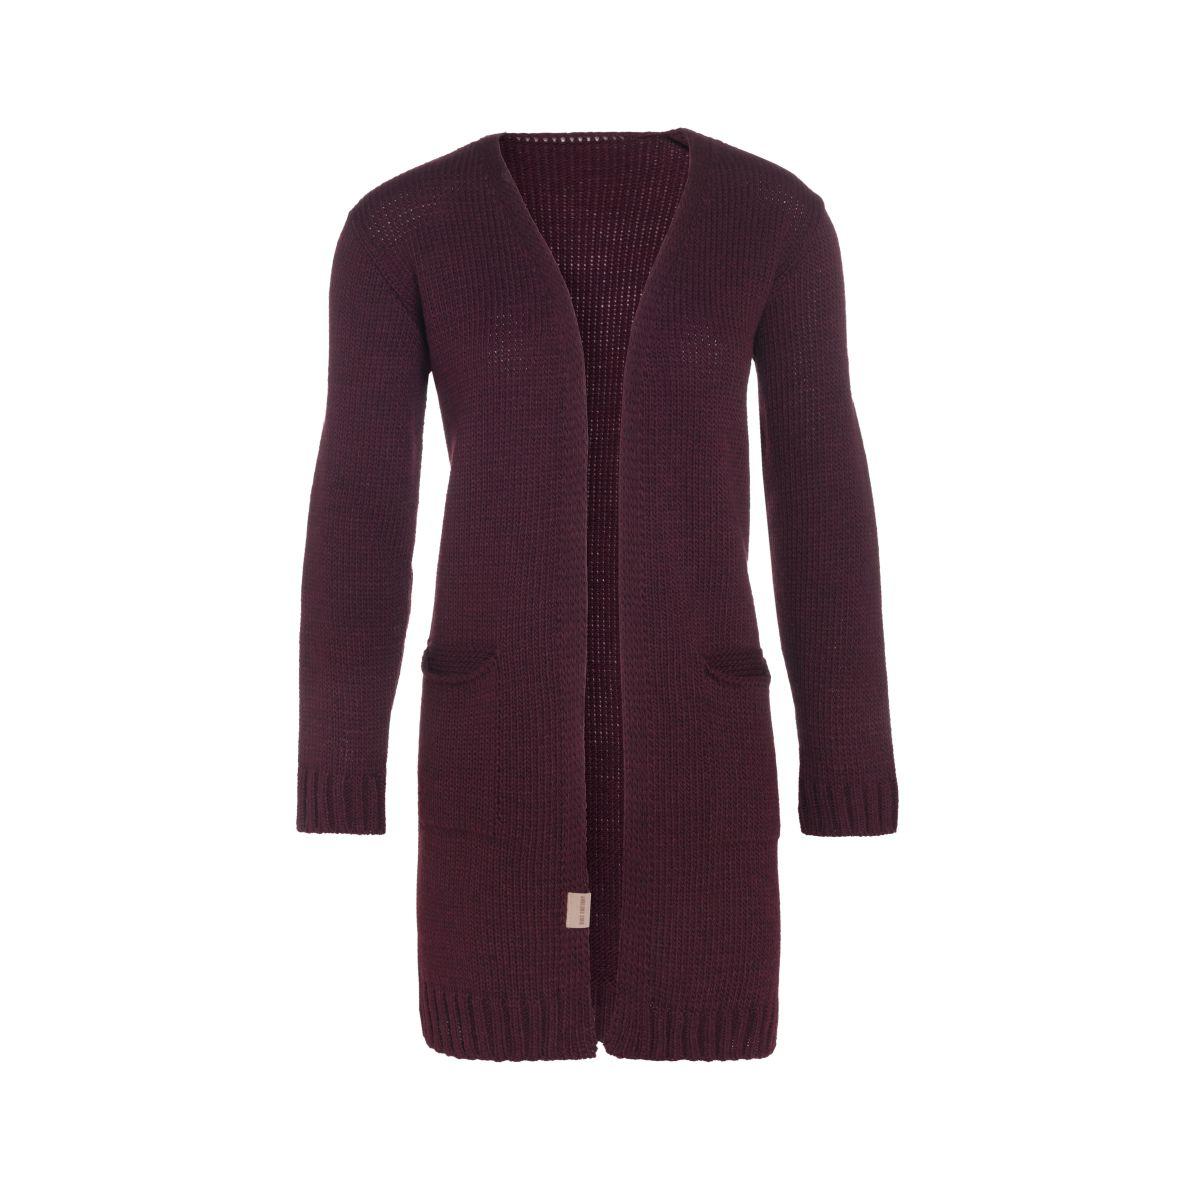 knit factory kf14008102351 ruby vest aubergine 4042 1